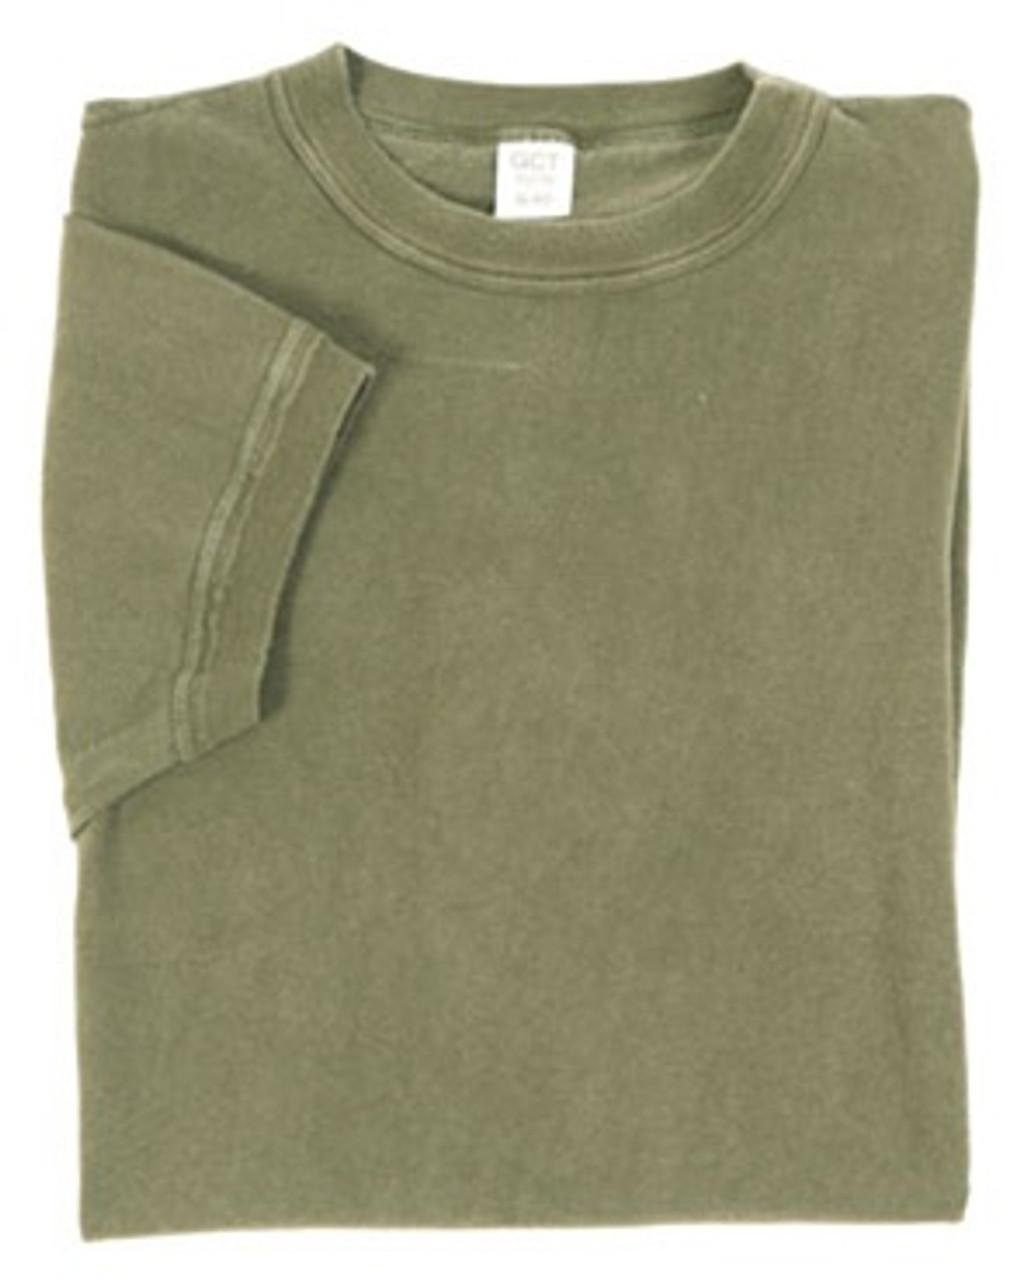 BW OD Short Sleeve Shirt from Hessen Surplus